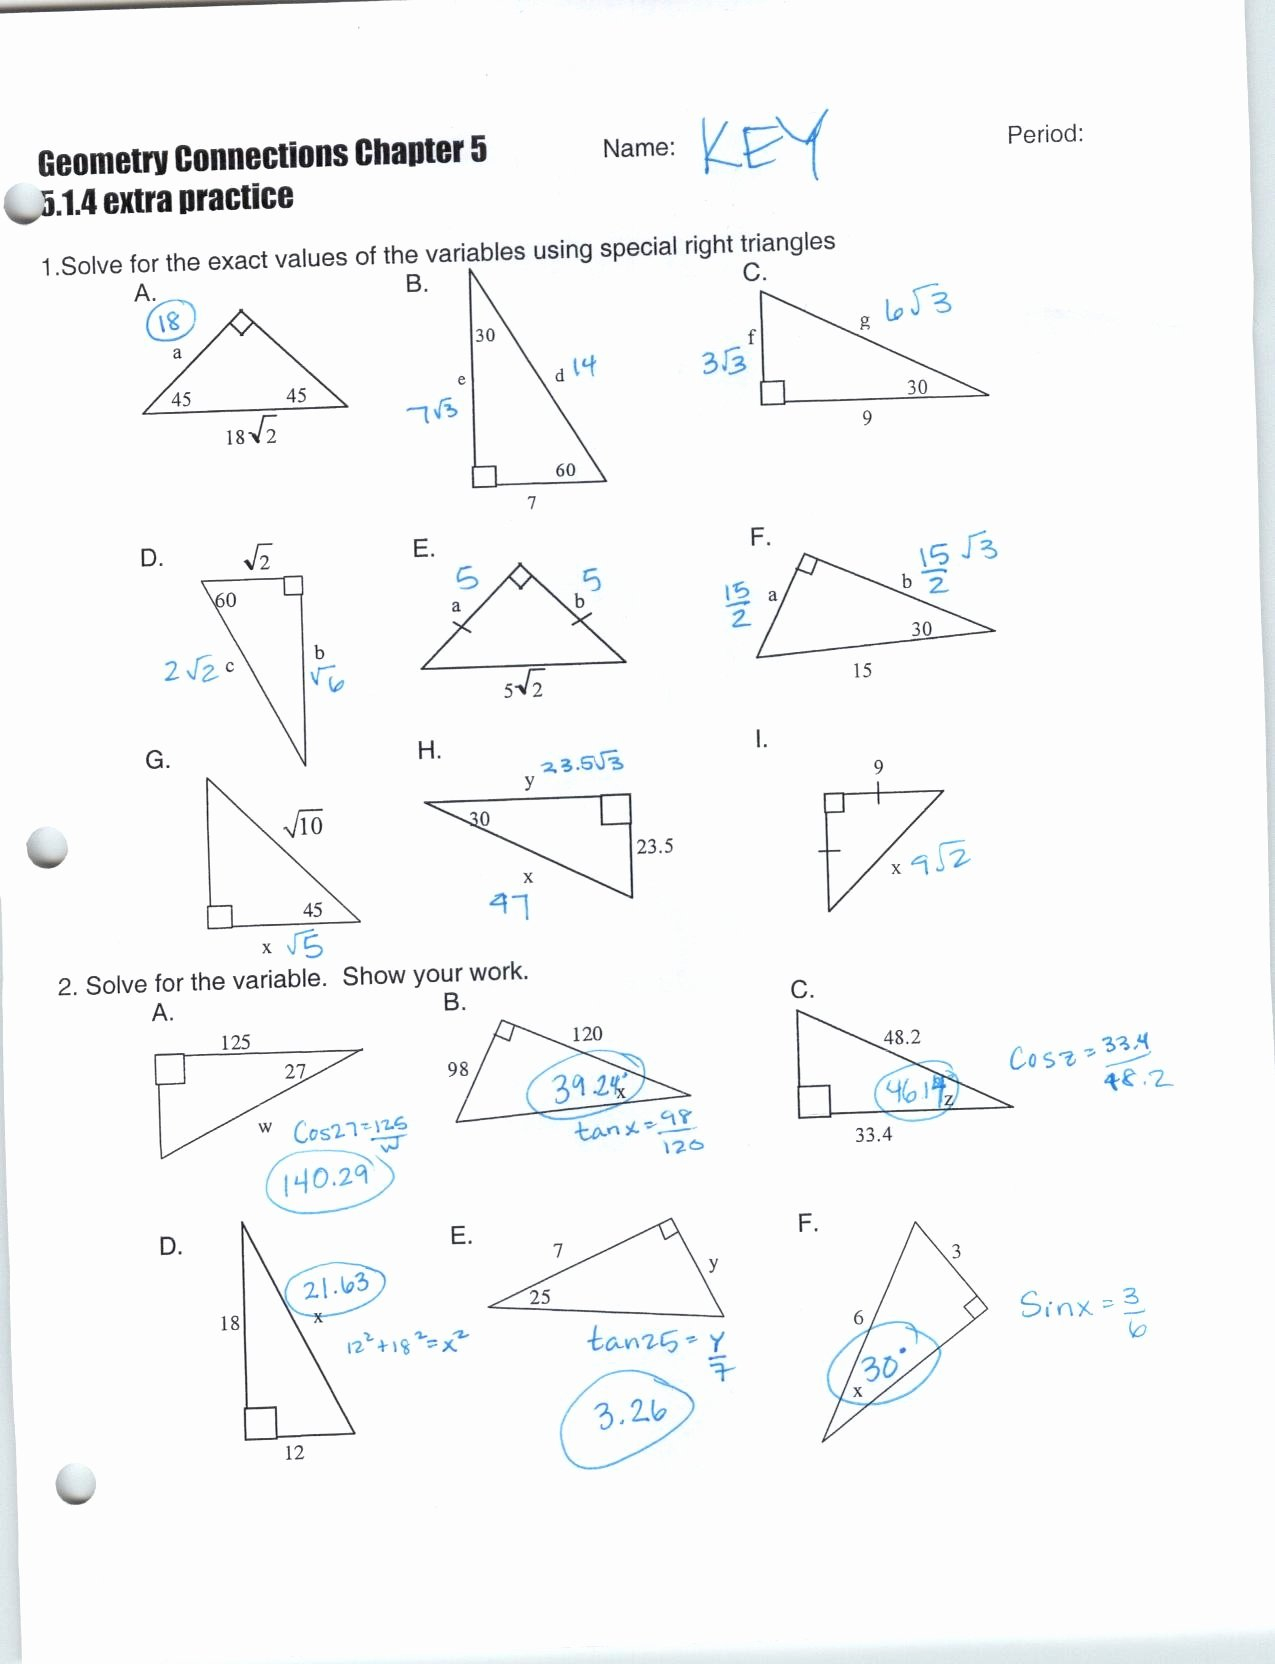 Worksheet Trigonometric Ratios Worksheet Worksheet On Trig Ratios Throughout Right Triangle Trigonometry Worksheet Answers